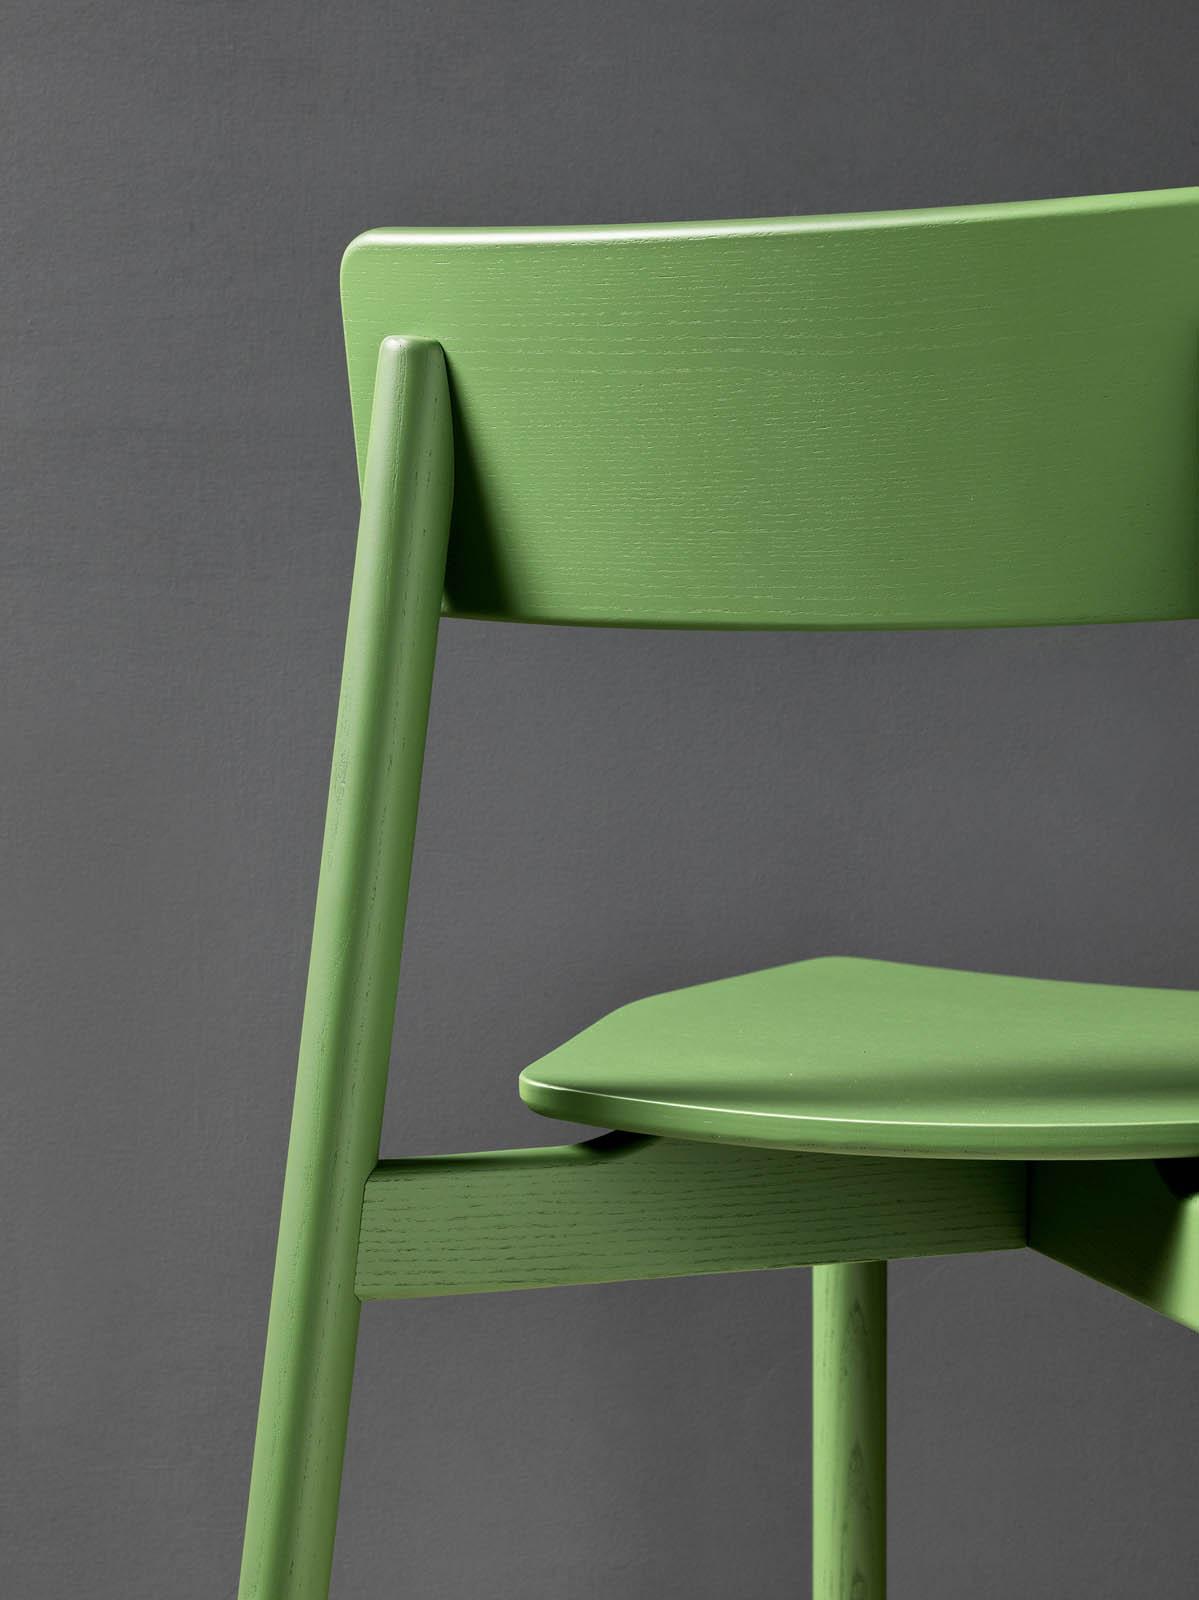 Rib | Very Wood | Italian Chair Makers - Very Wood